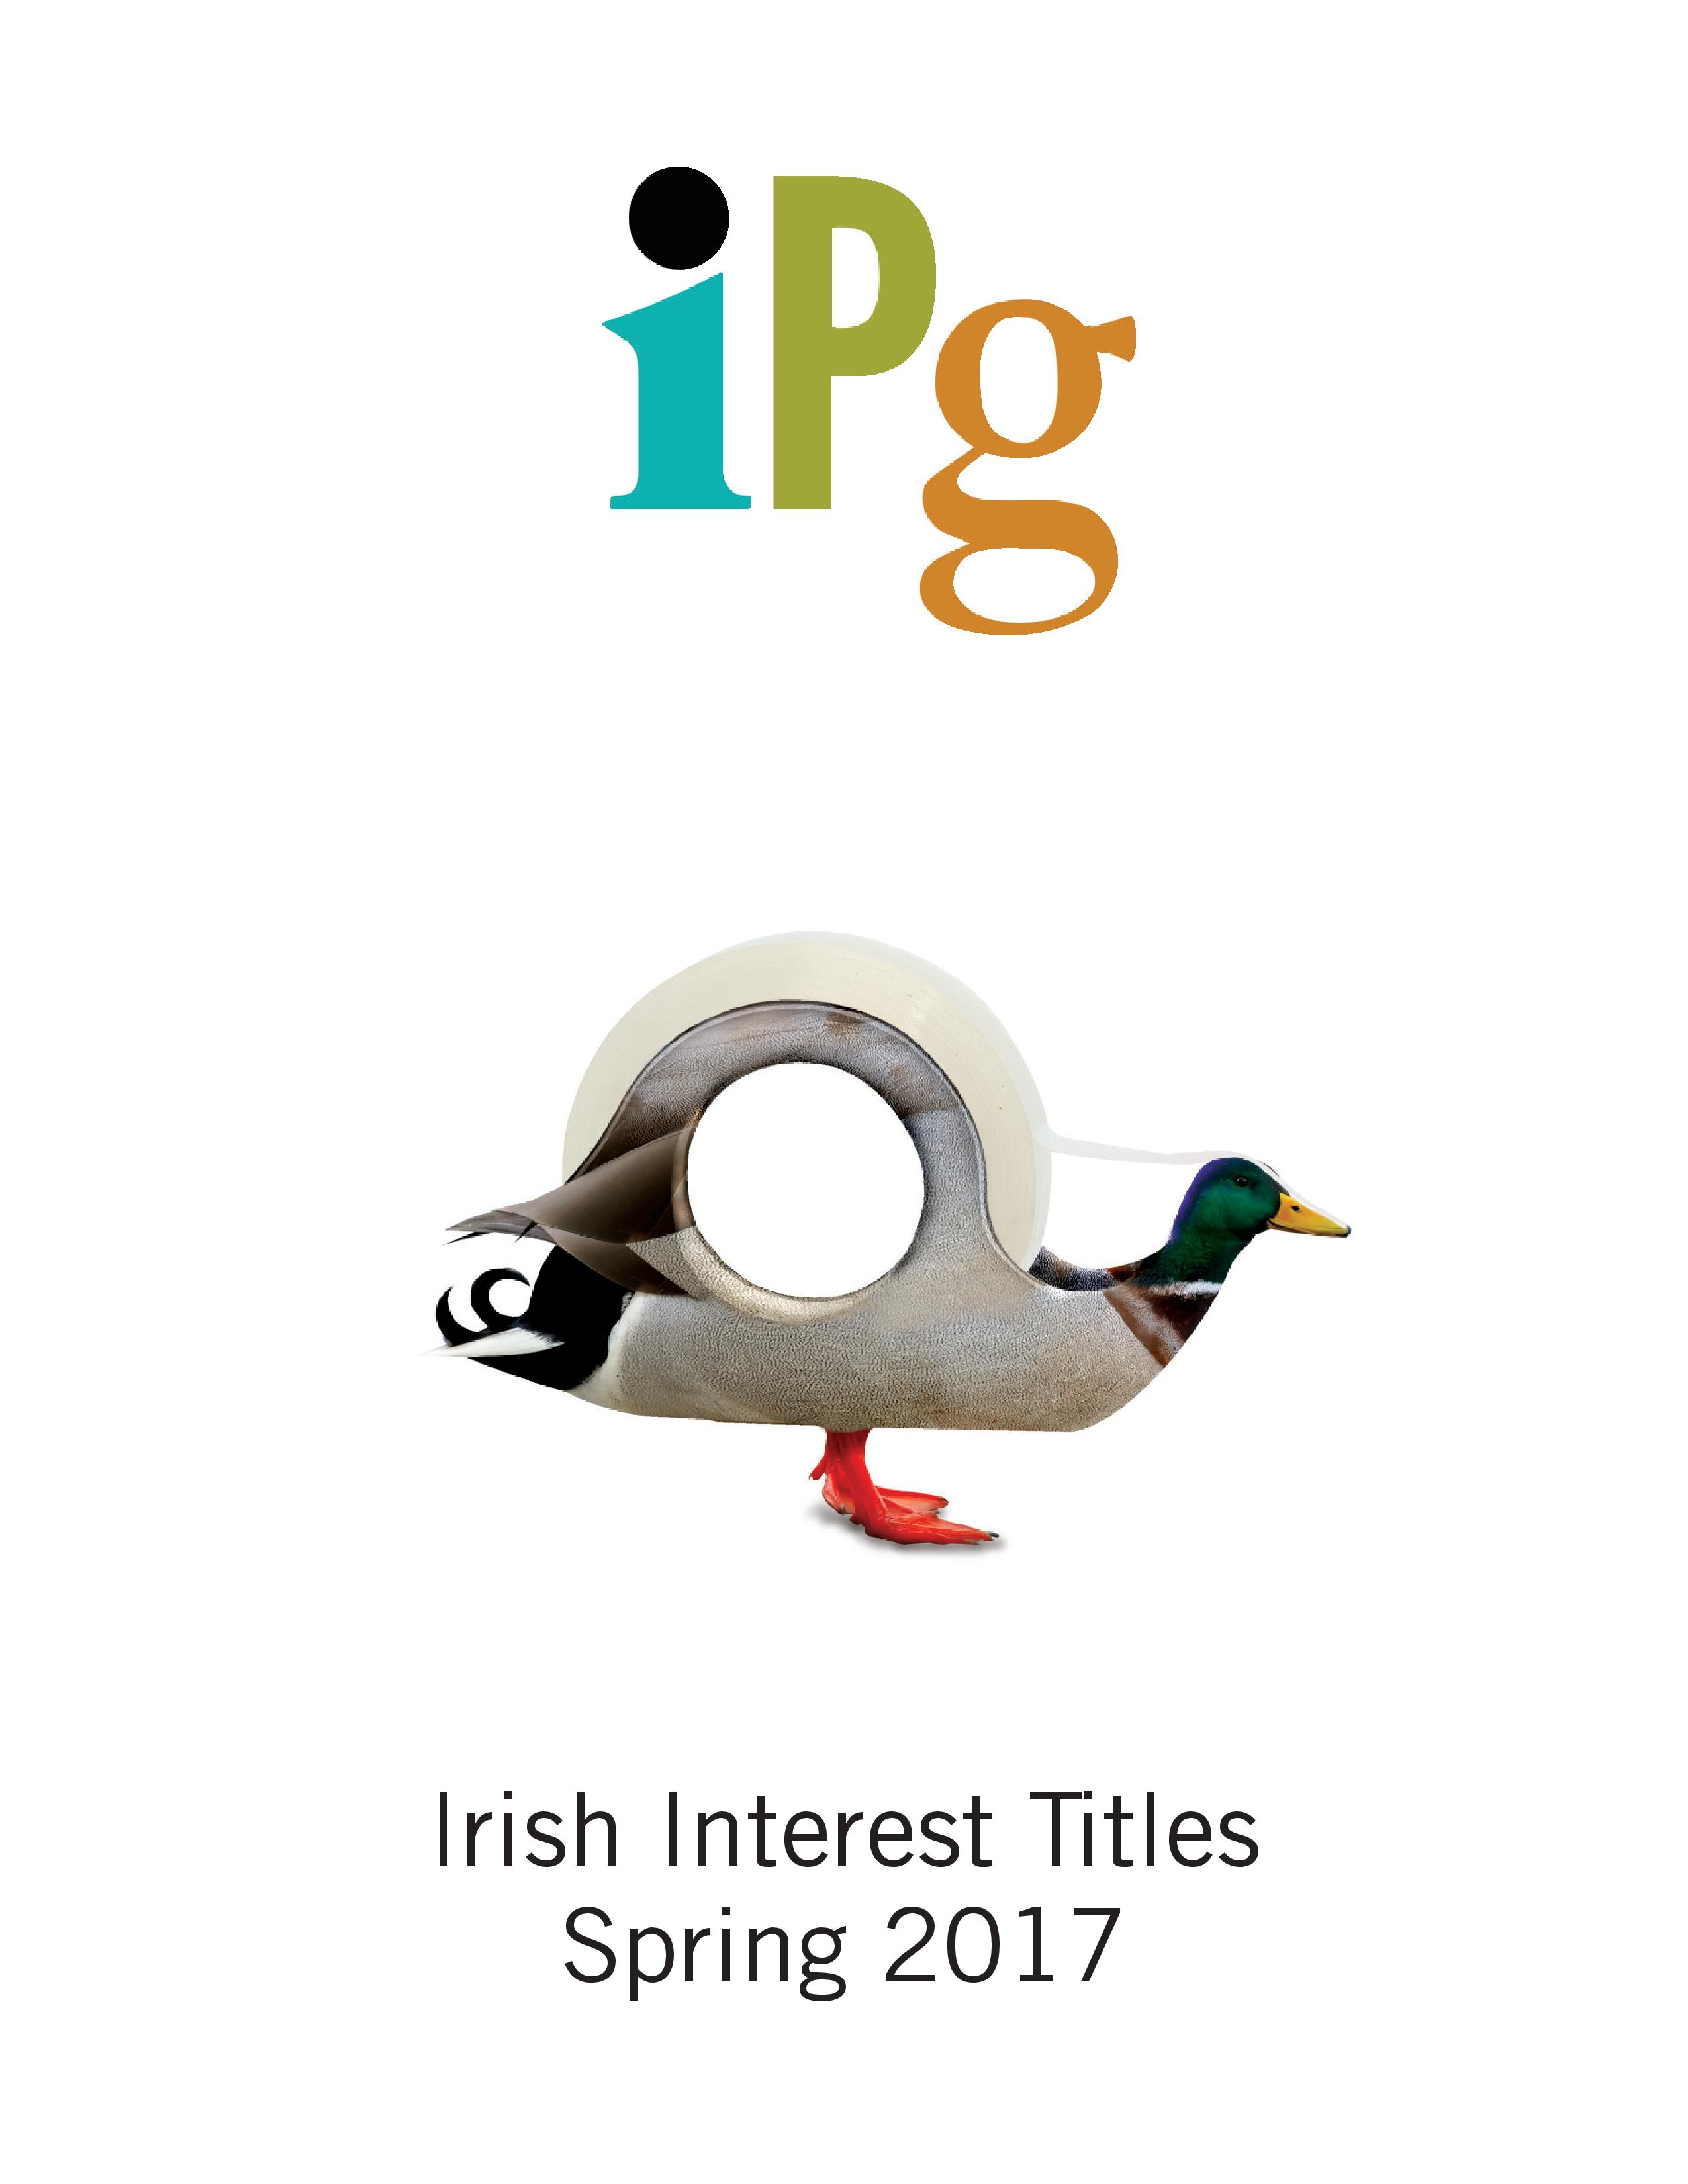 Irish Interest Titles